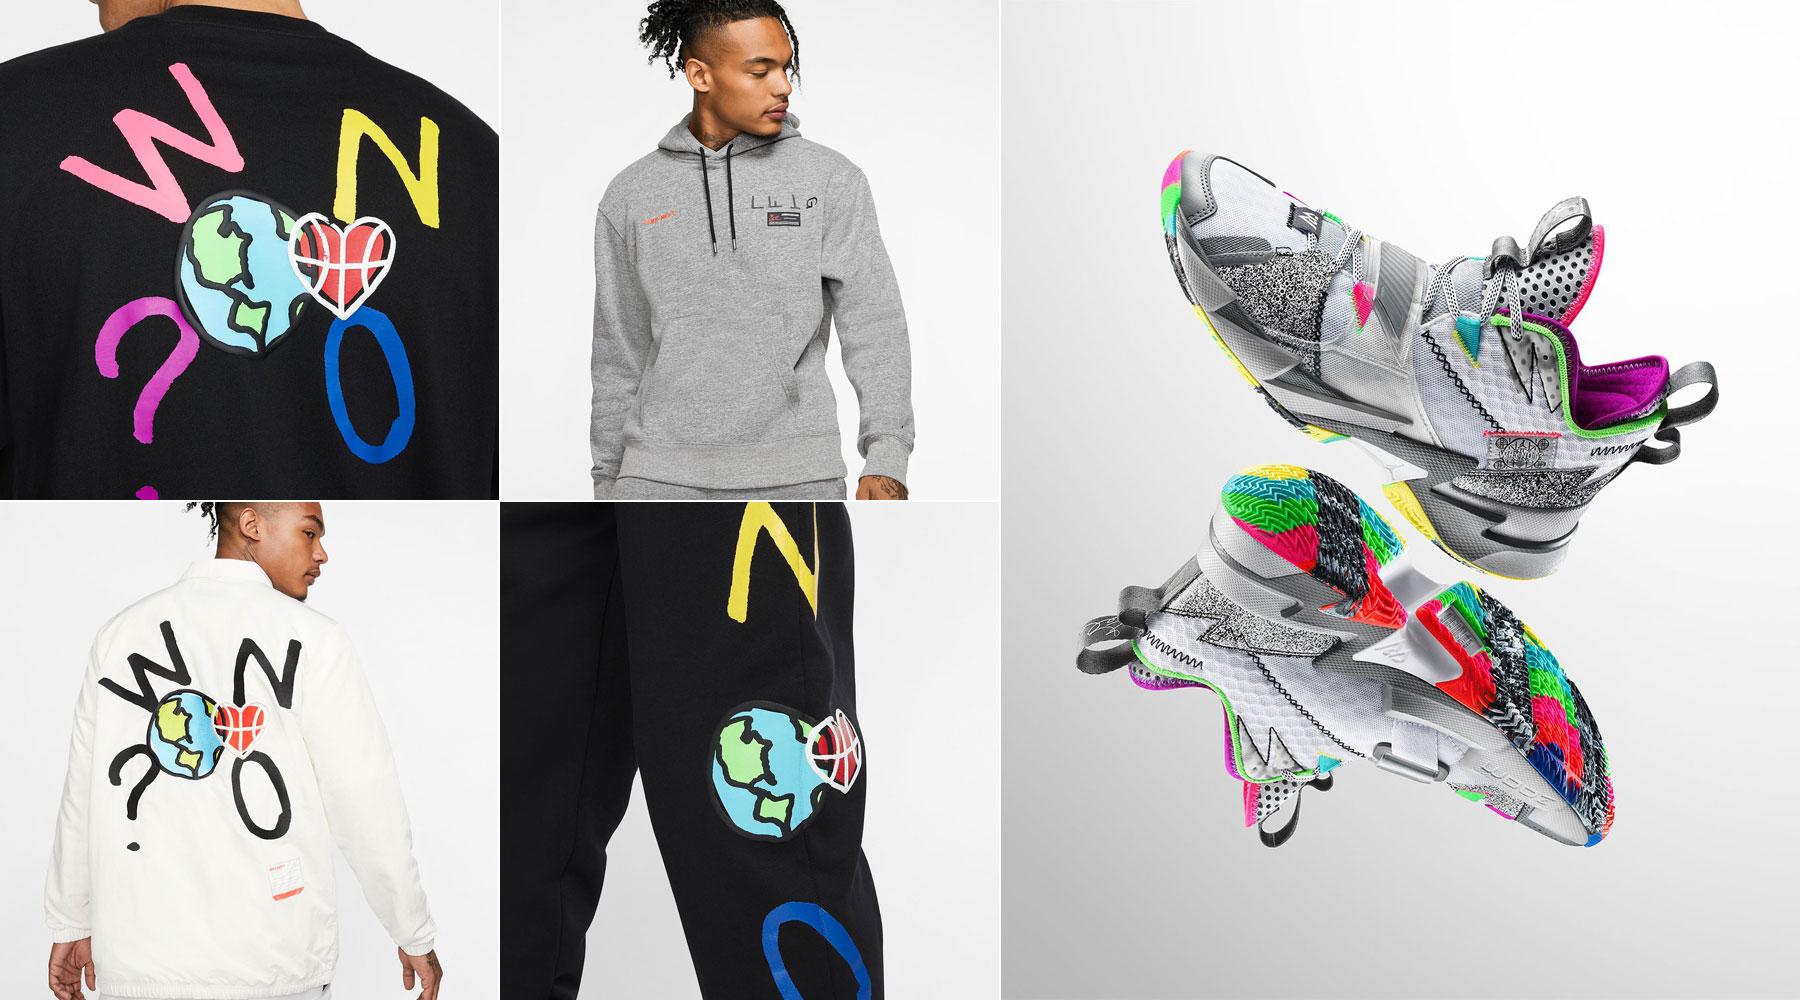 revolución microondas vestir  Jordan Why Not Zer03 Zer0 Noise Clothing | SneakerFits.com